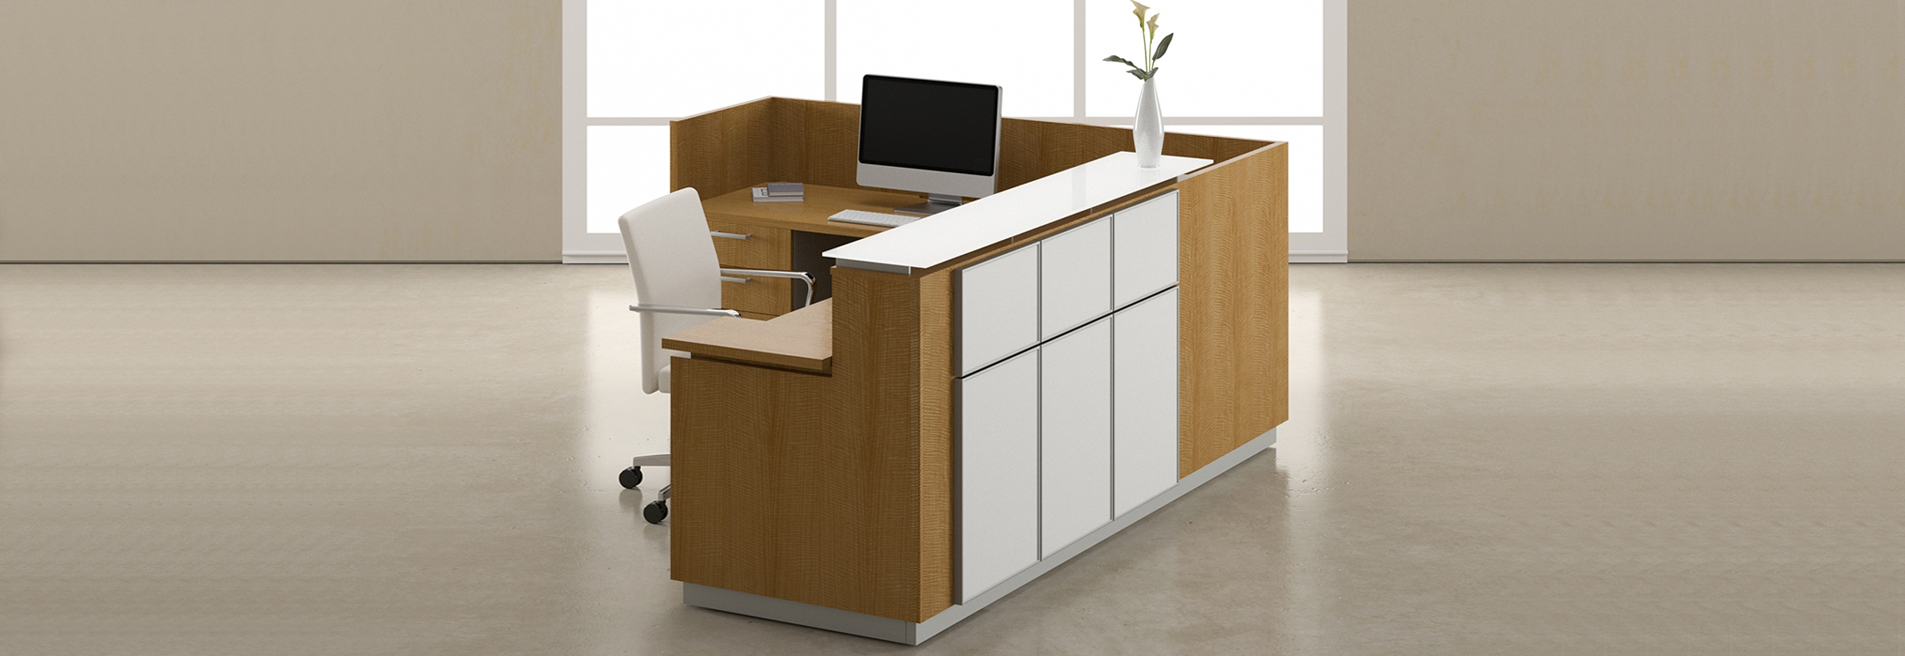 Office Reception Desk L Shaped Reception Desk Wood Reception Desk Custom Reception Desk